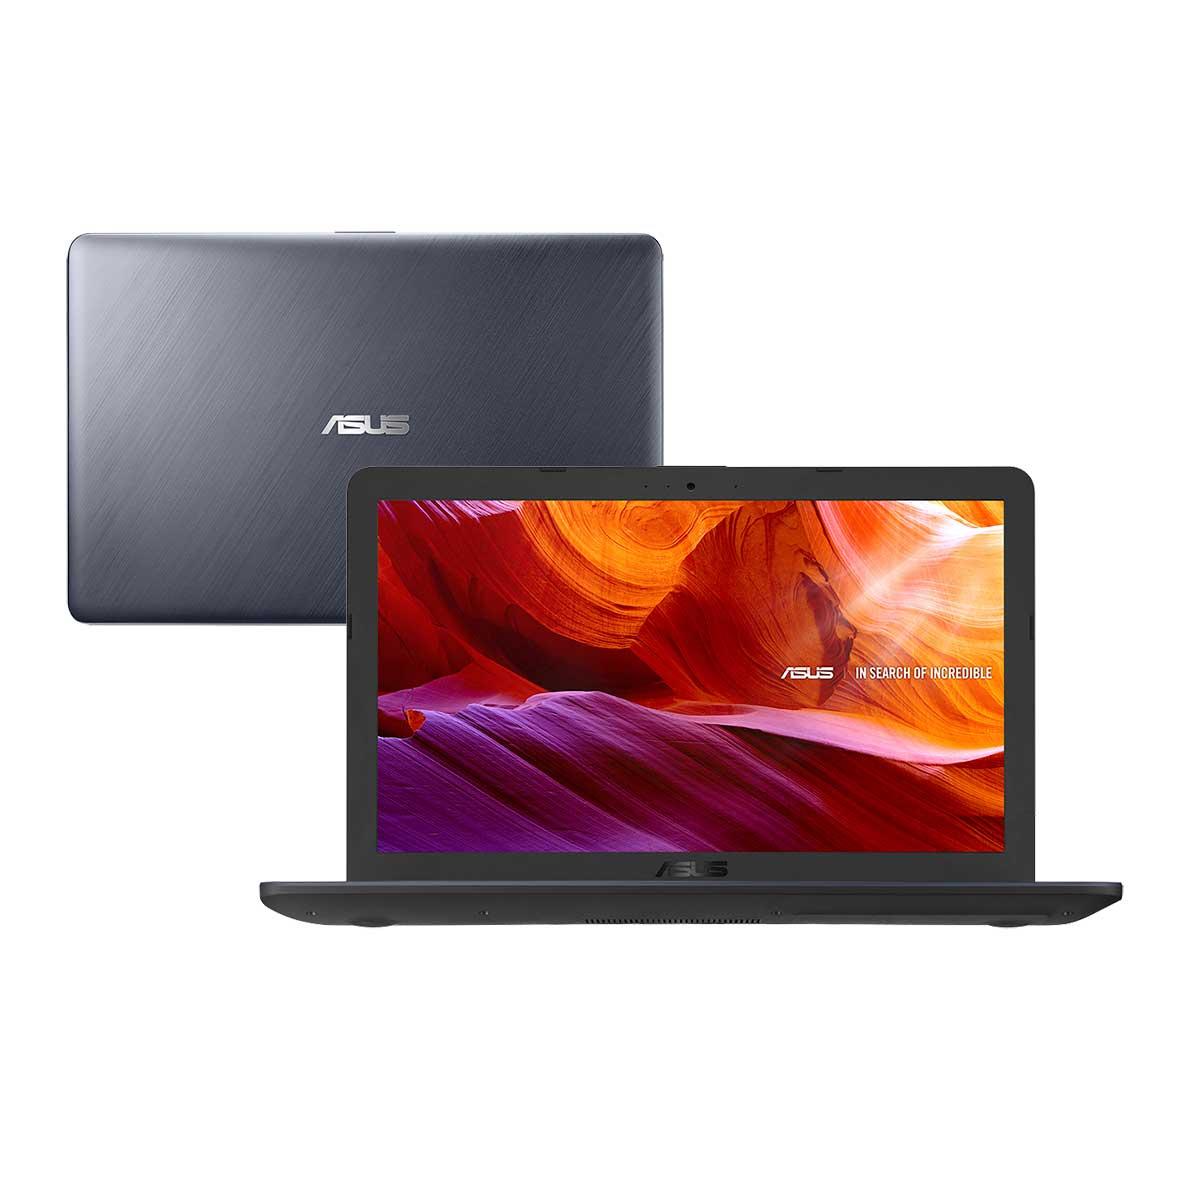 Imagem de Notebook Asus Vivobook Celeron Dual Core 4gb Ram 500gb Win 10 15,6